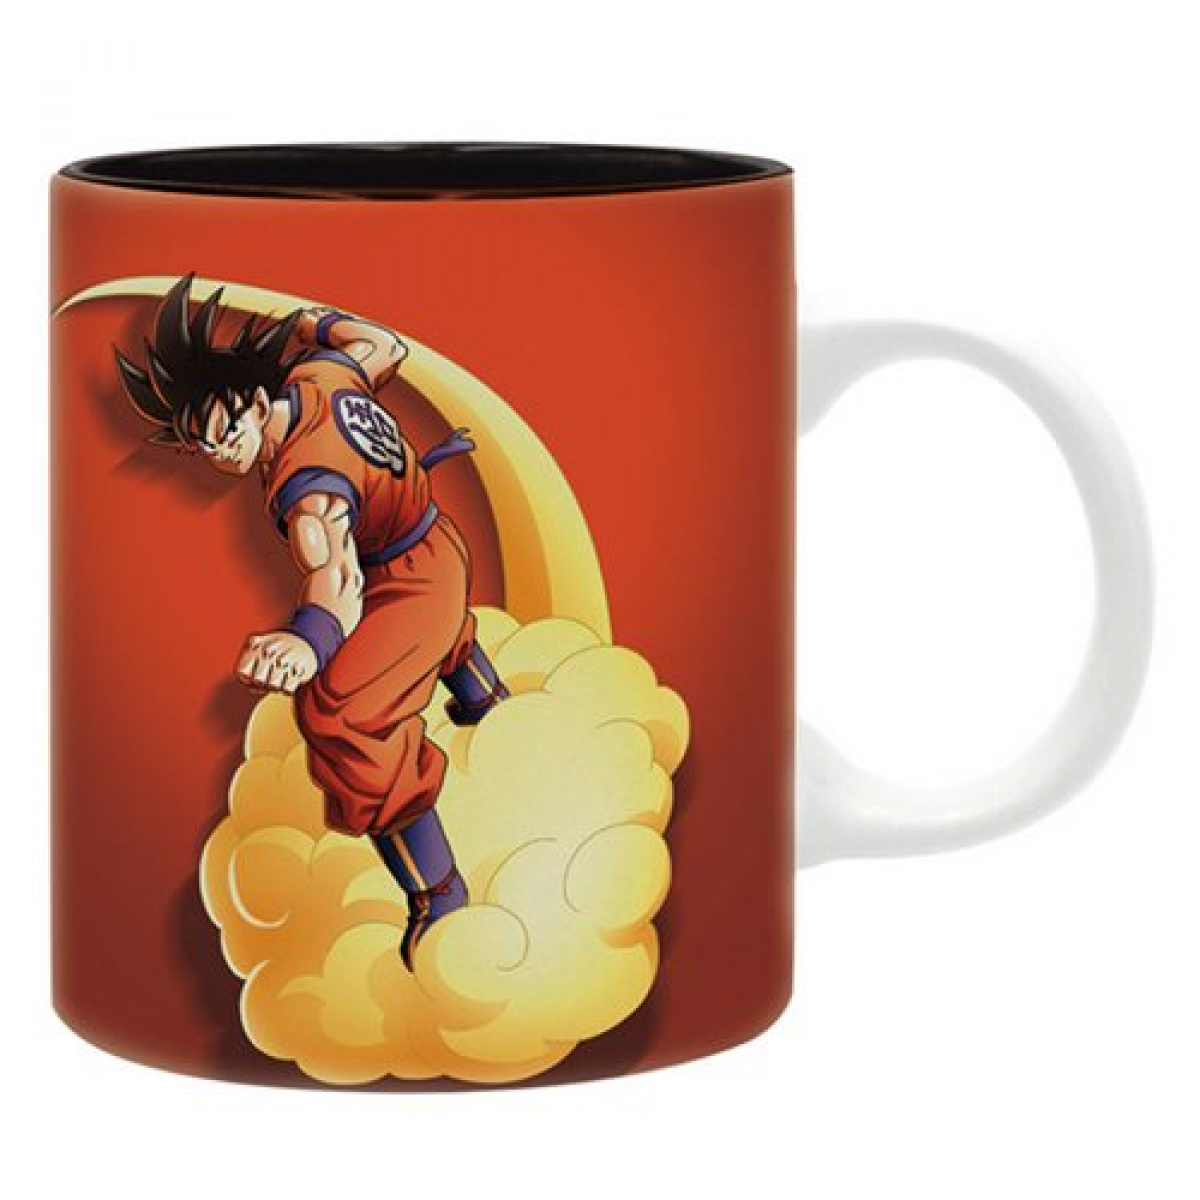 Dragon Ball Z Kakarot: Goku Flying on Nimbus Cloud Mug Mugs 4